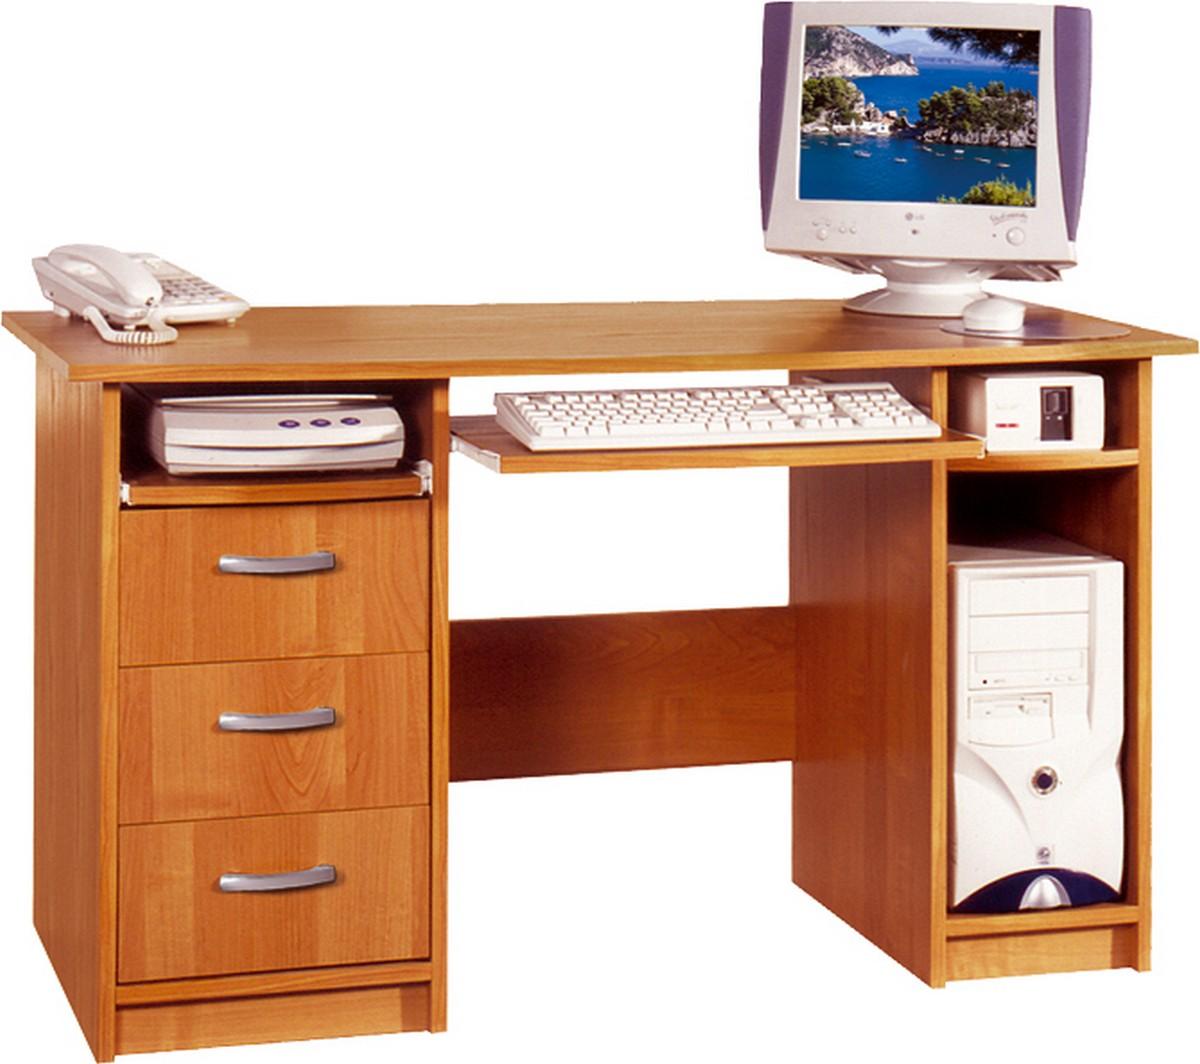 PC stolek - WIP - President